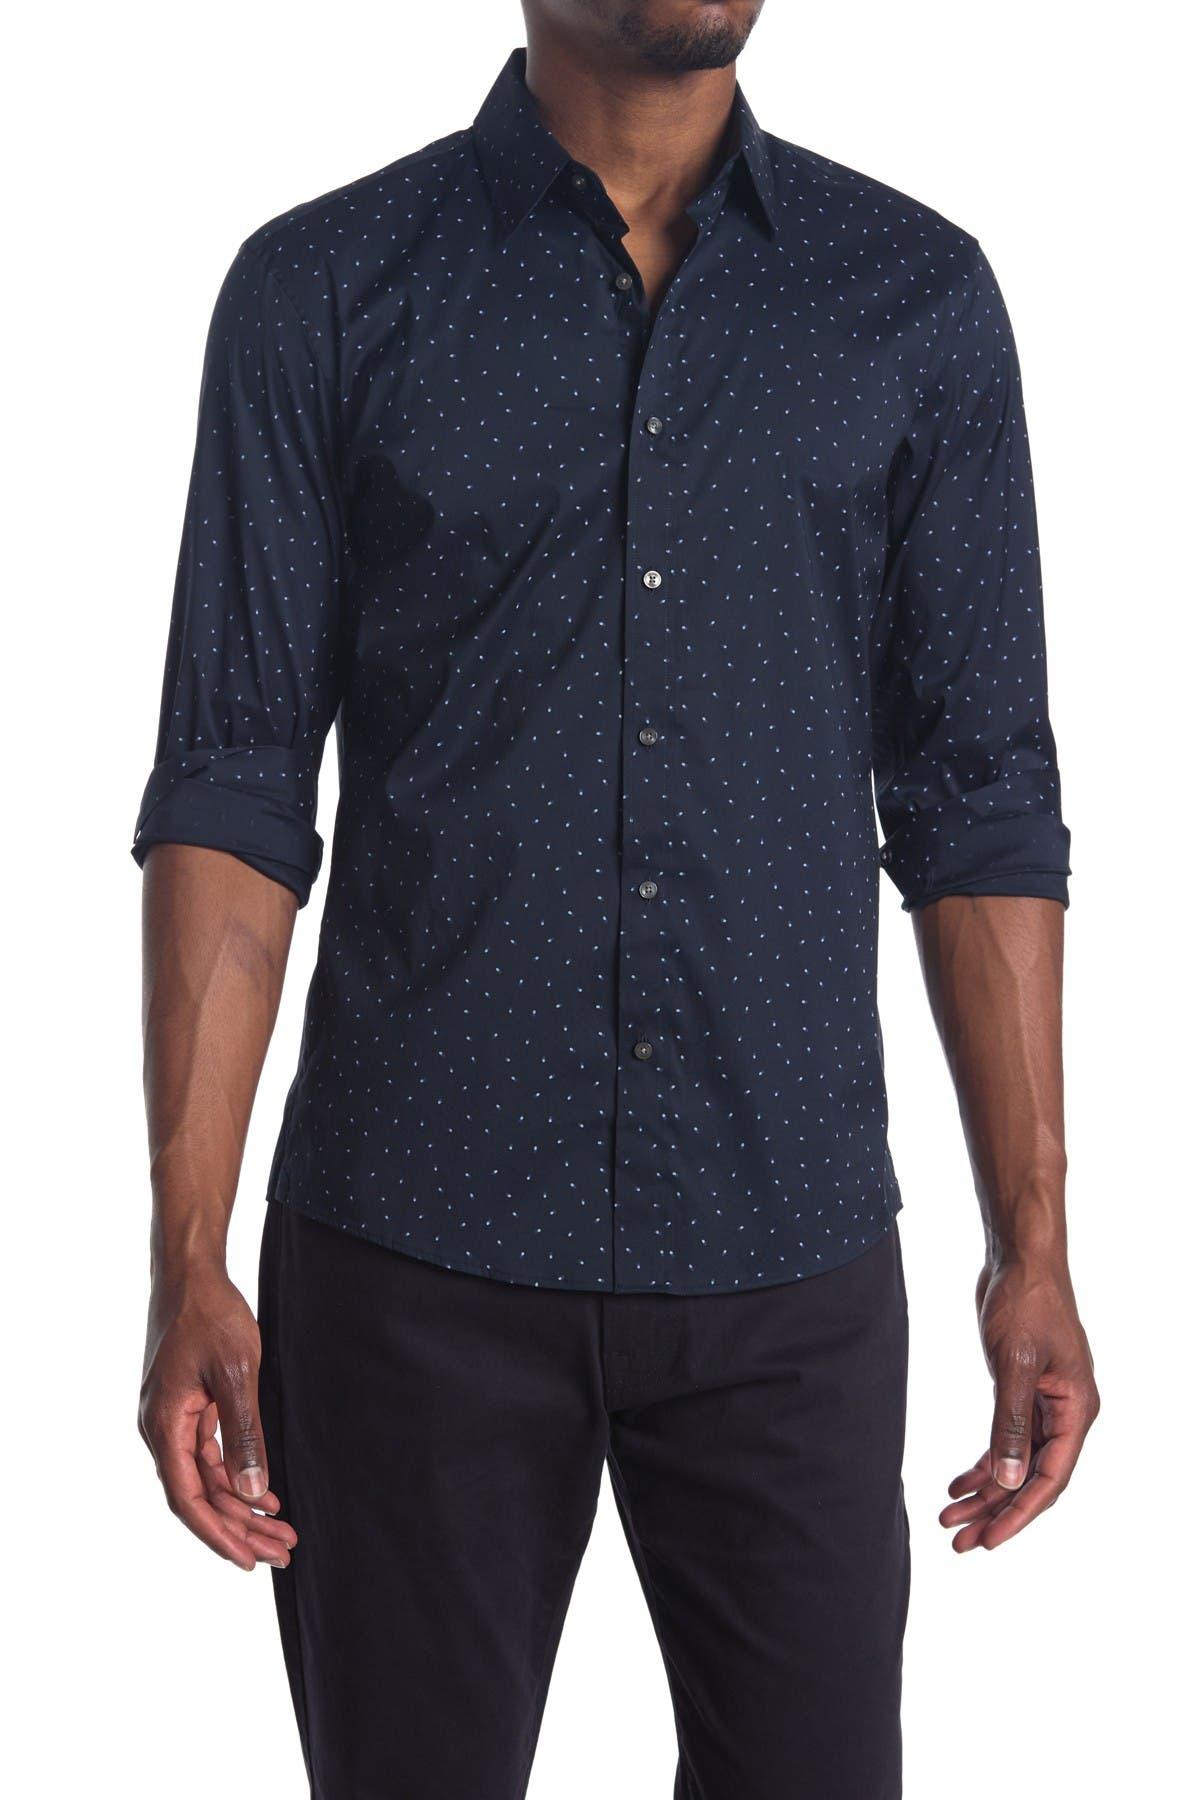 Image of Michael Kors Dot Print Reguar Fit Shirt